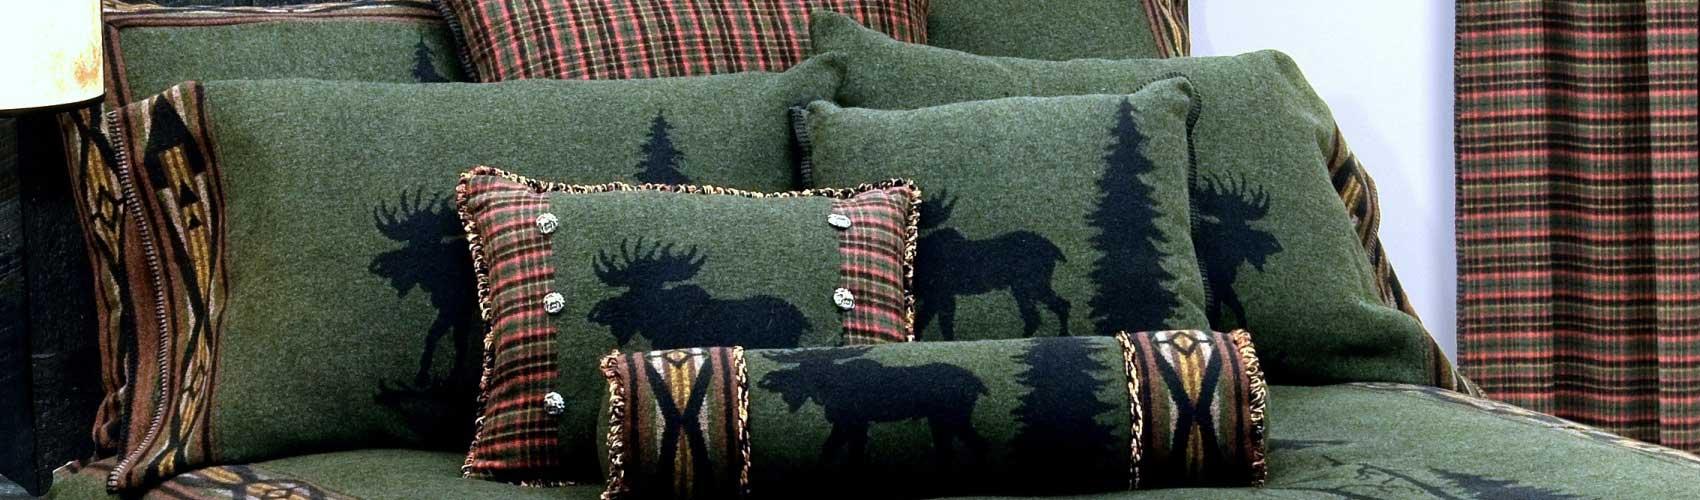 moose-bedding